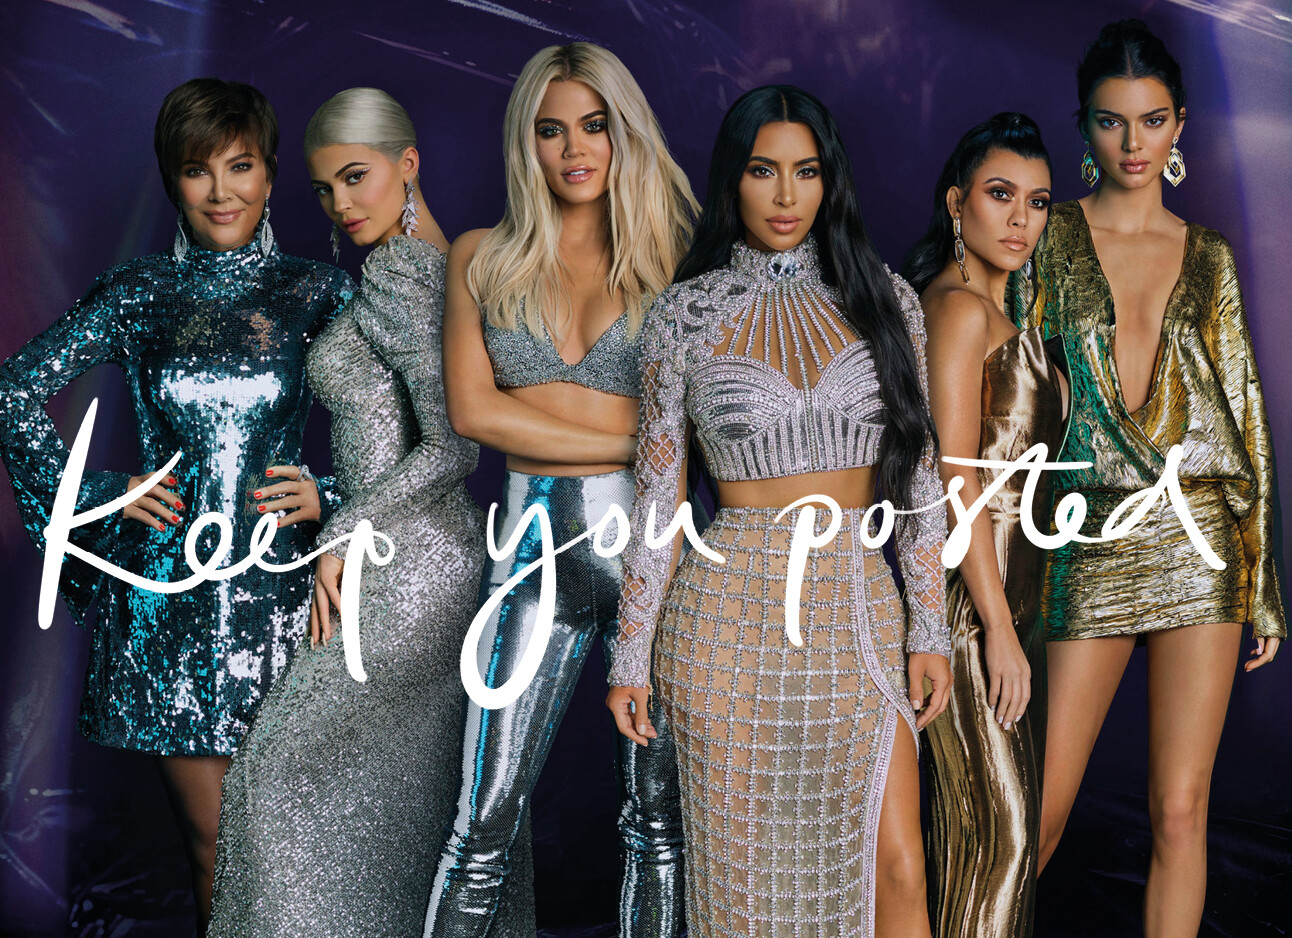 De 17 verrassende feitjes achter Keeping Up With The Kardashians